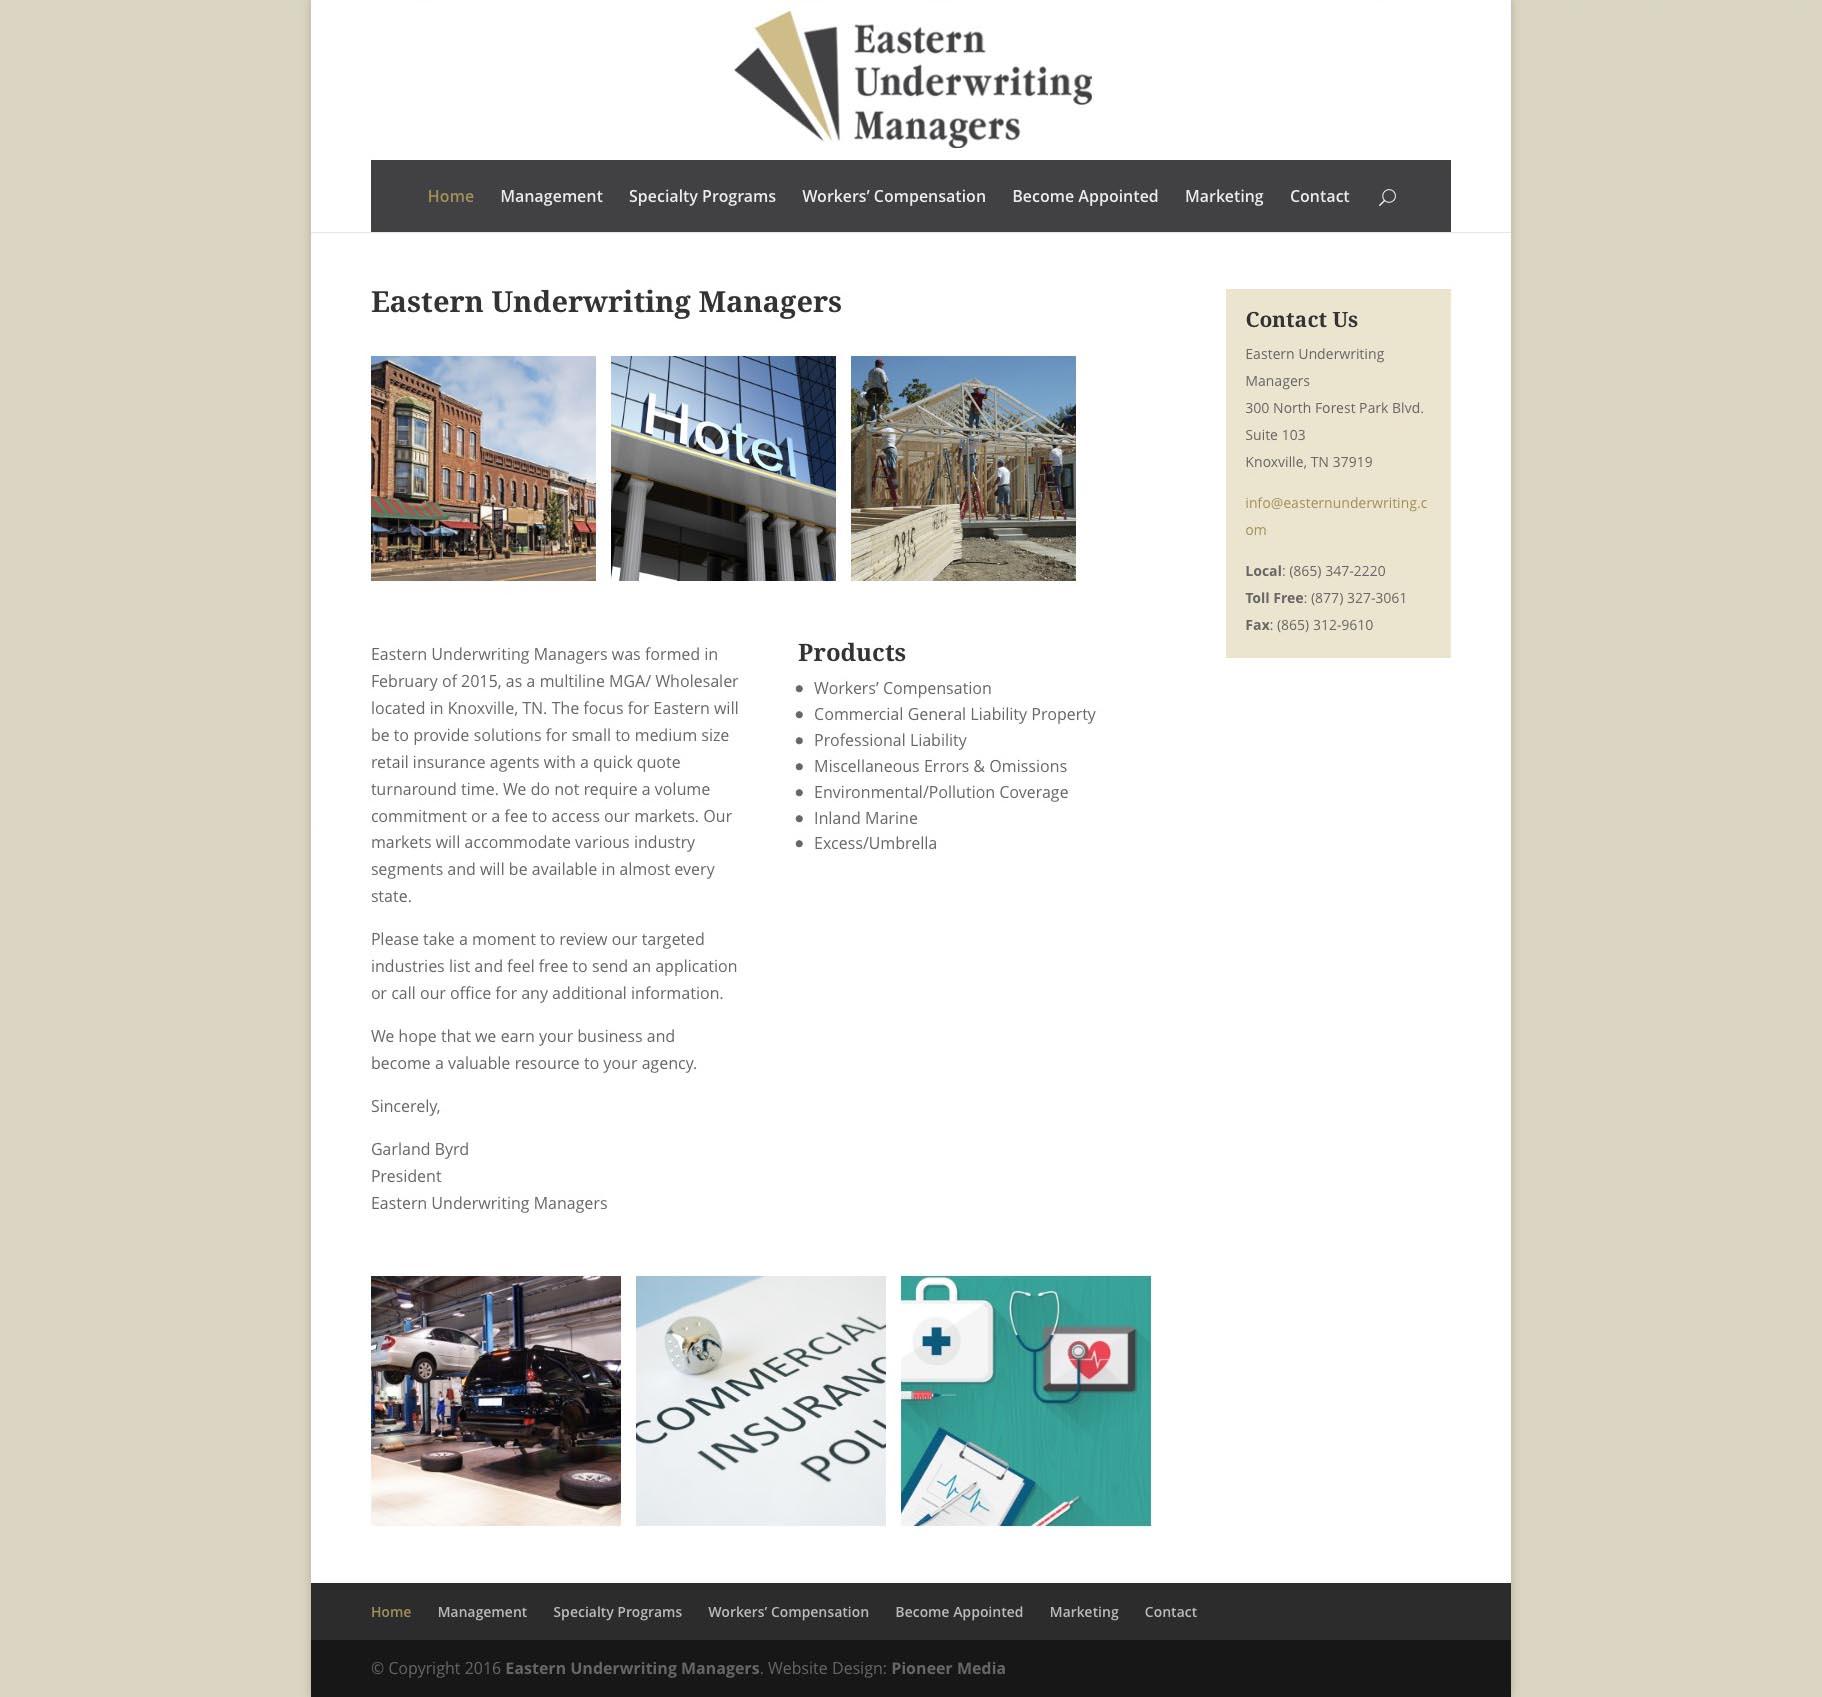 Eastern Underwriting Managers Website Design